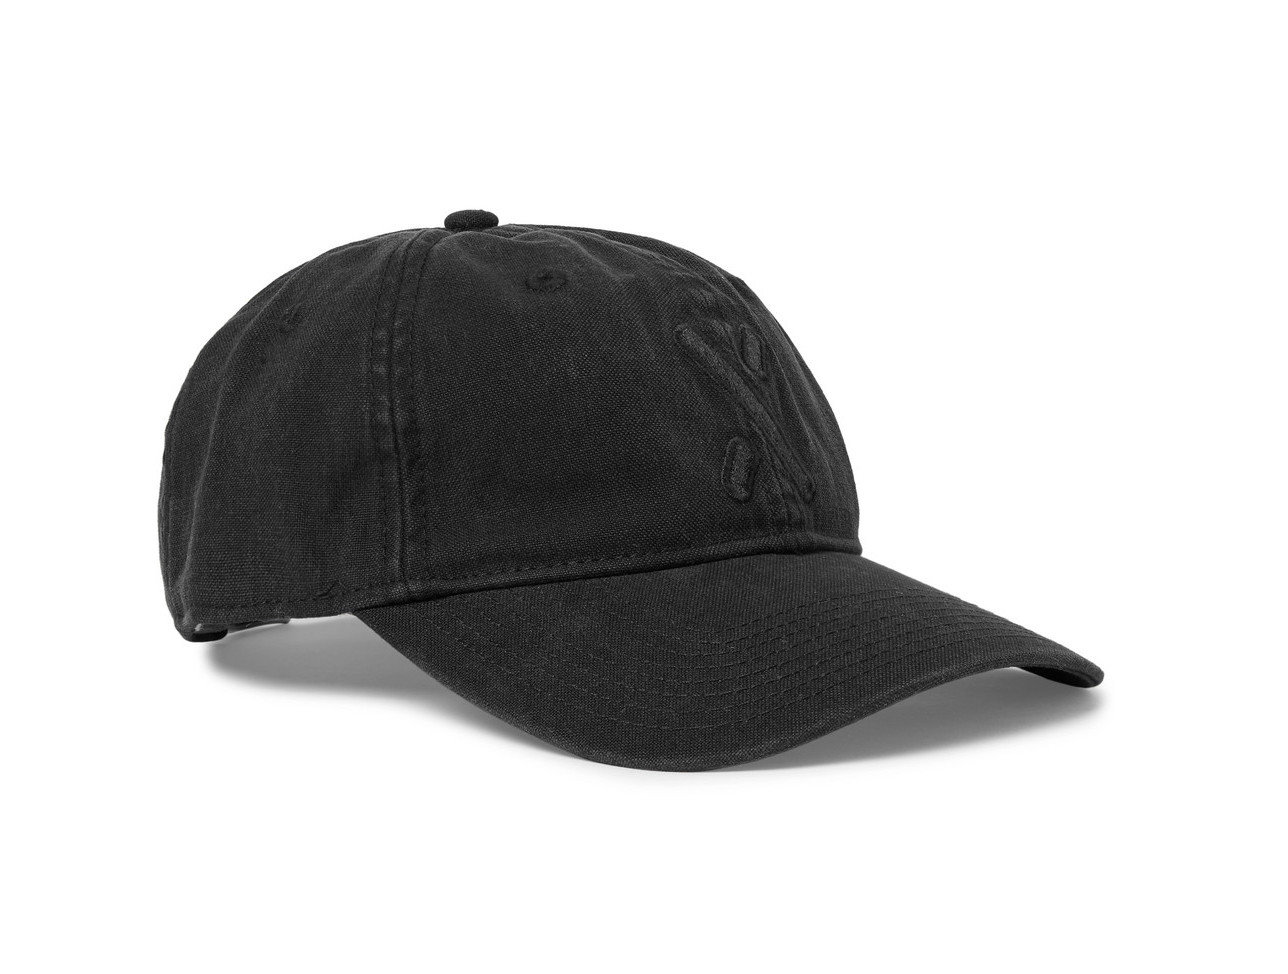 Beach Style + Design Travel Shop black cap headgear baseball cap product product design